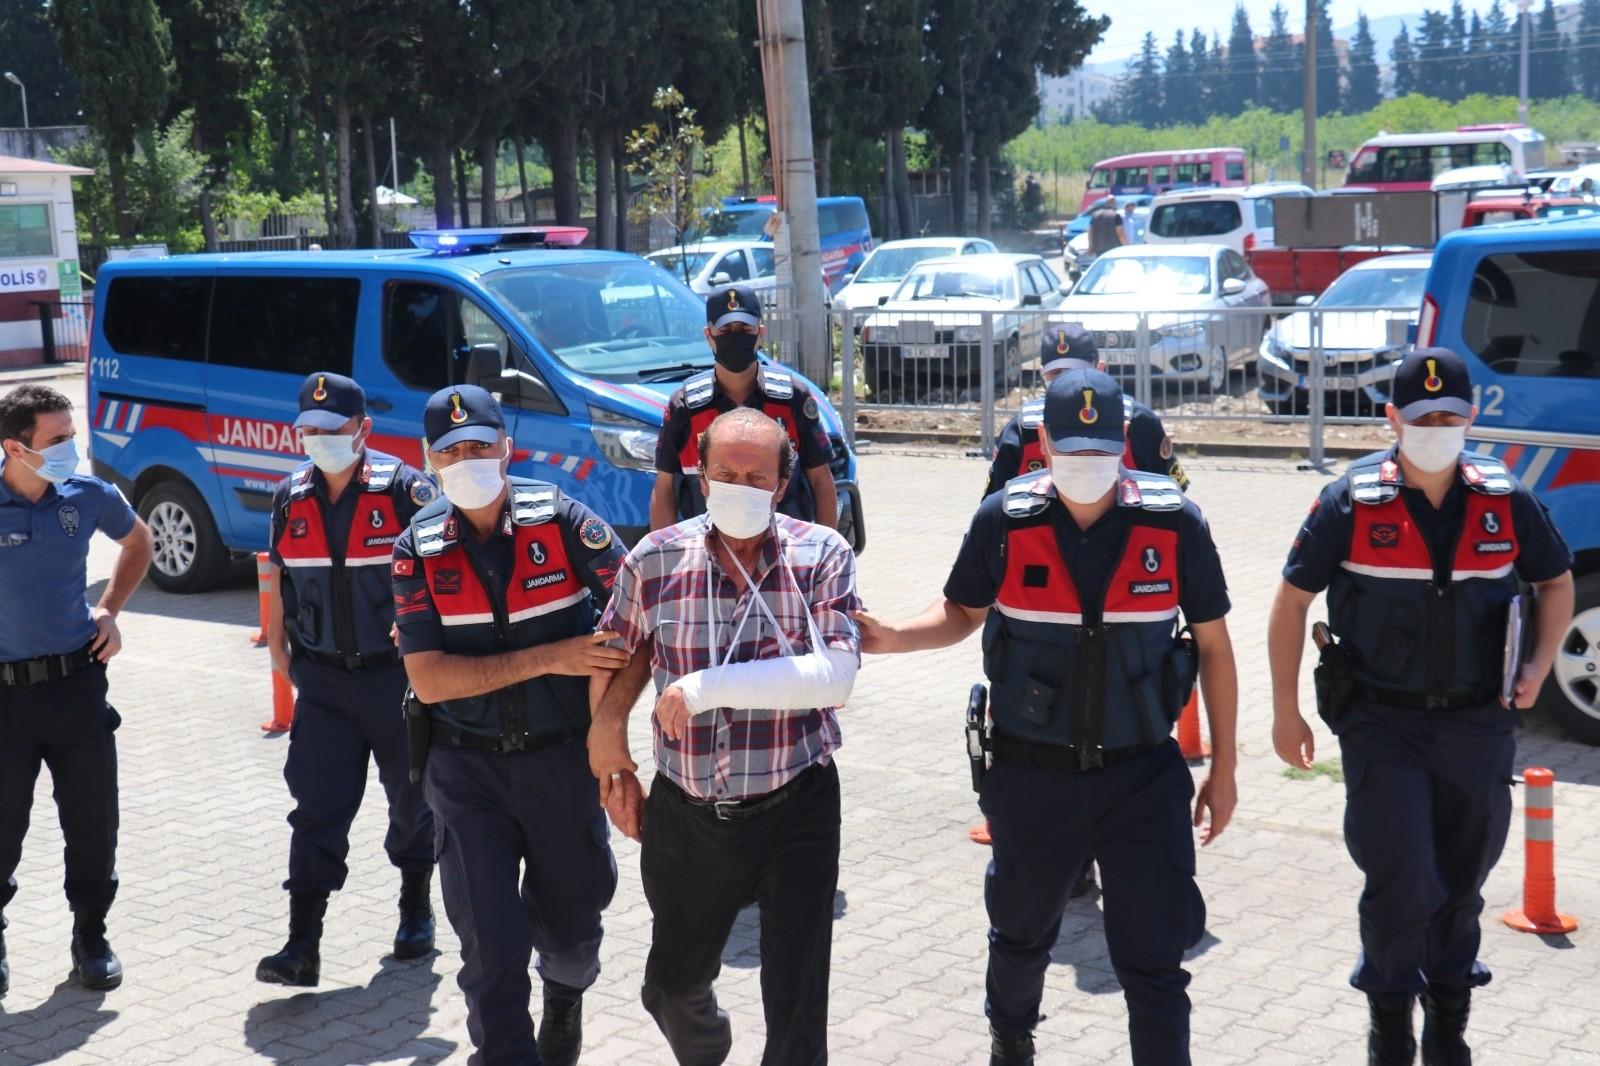 Yalova'da minibüs sırası cinayetinin zanlısı adliyeye sevk edildi